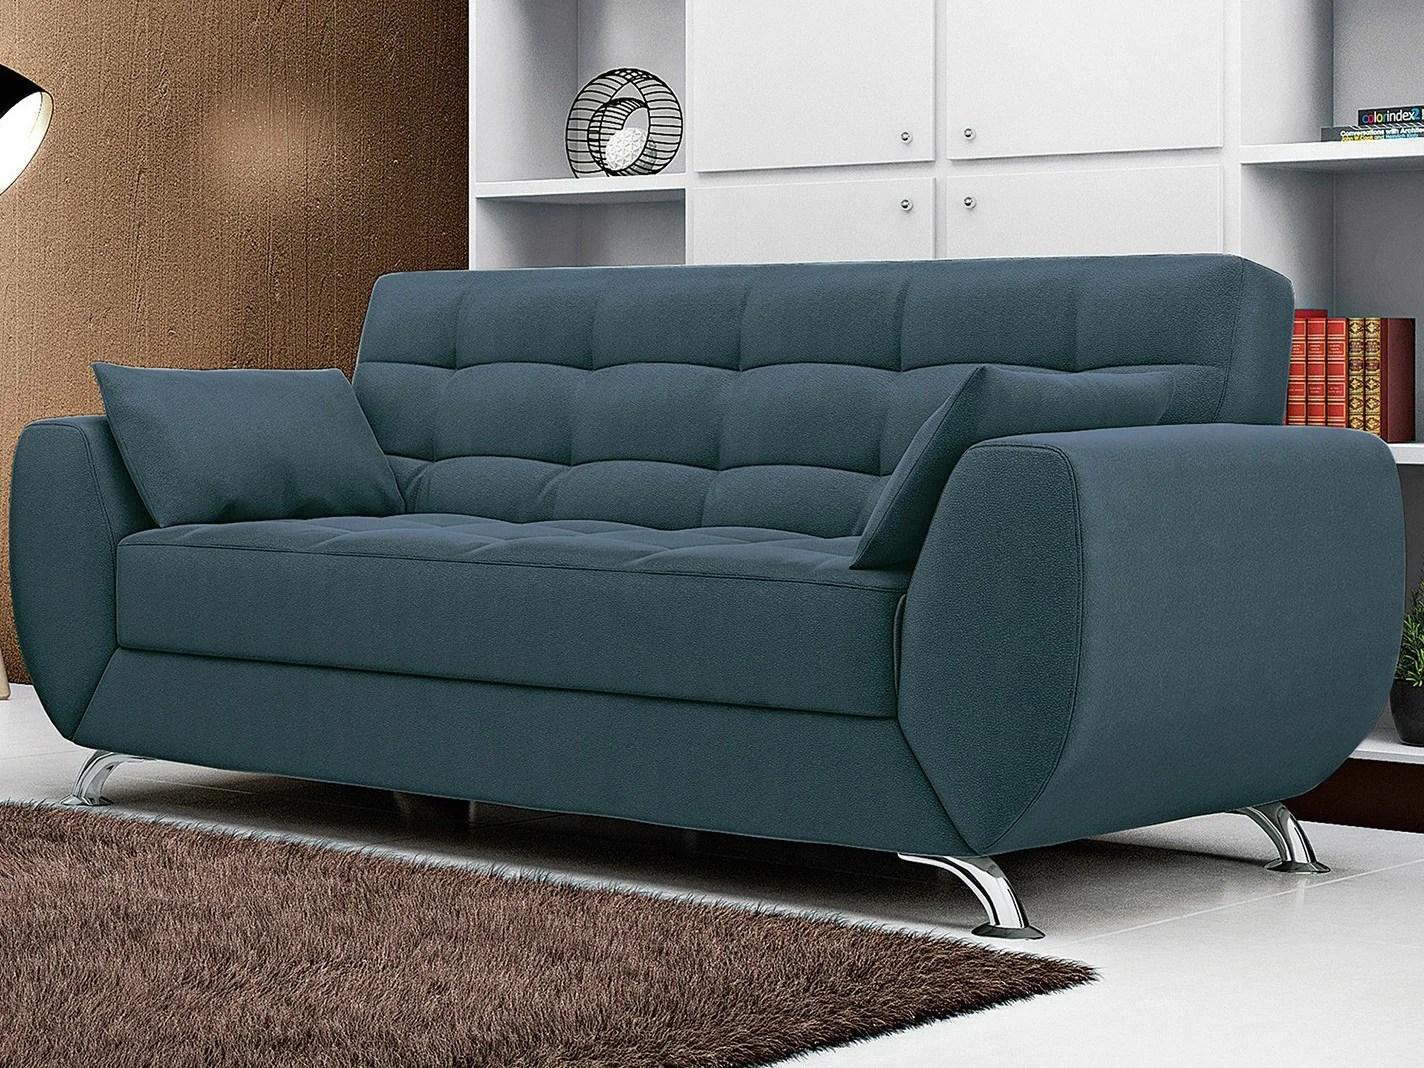 sofa modernos 2017 bonded leather durability sofá 3 lugares suede elegance larissa linoforte sofás